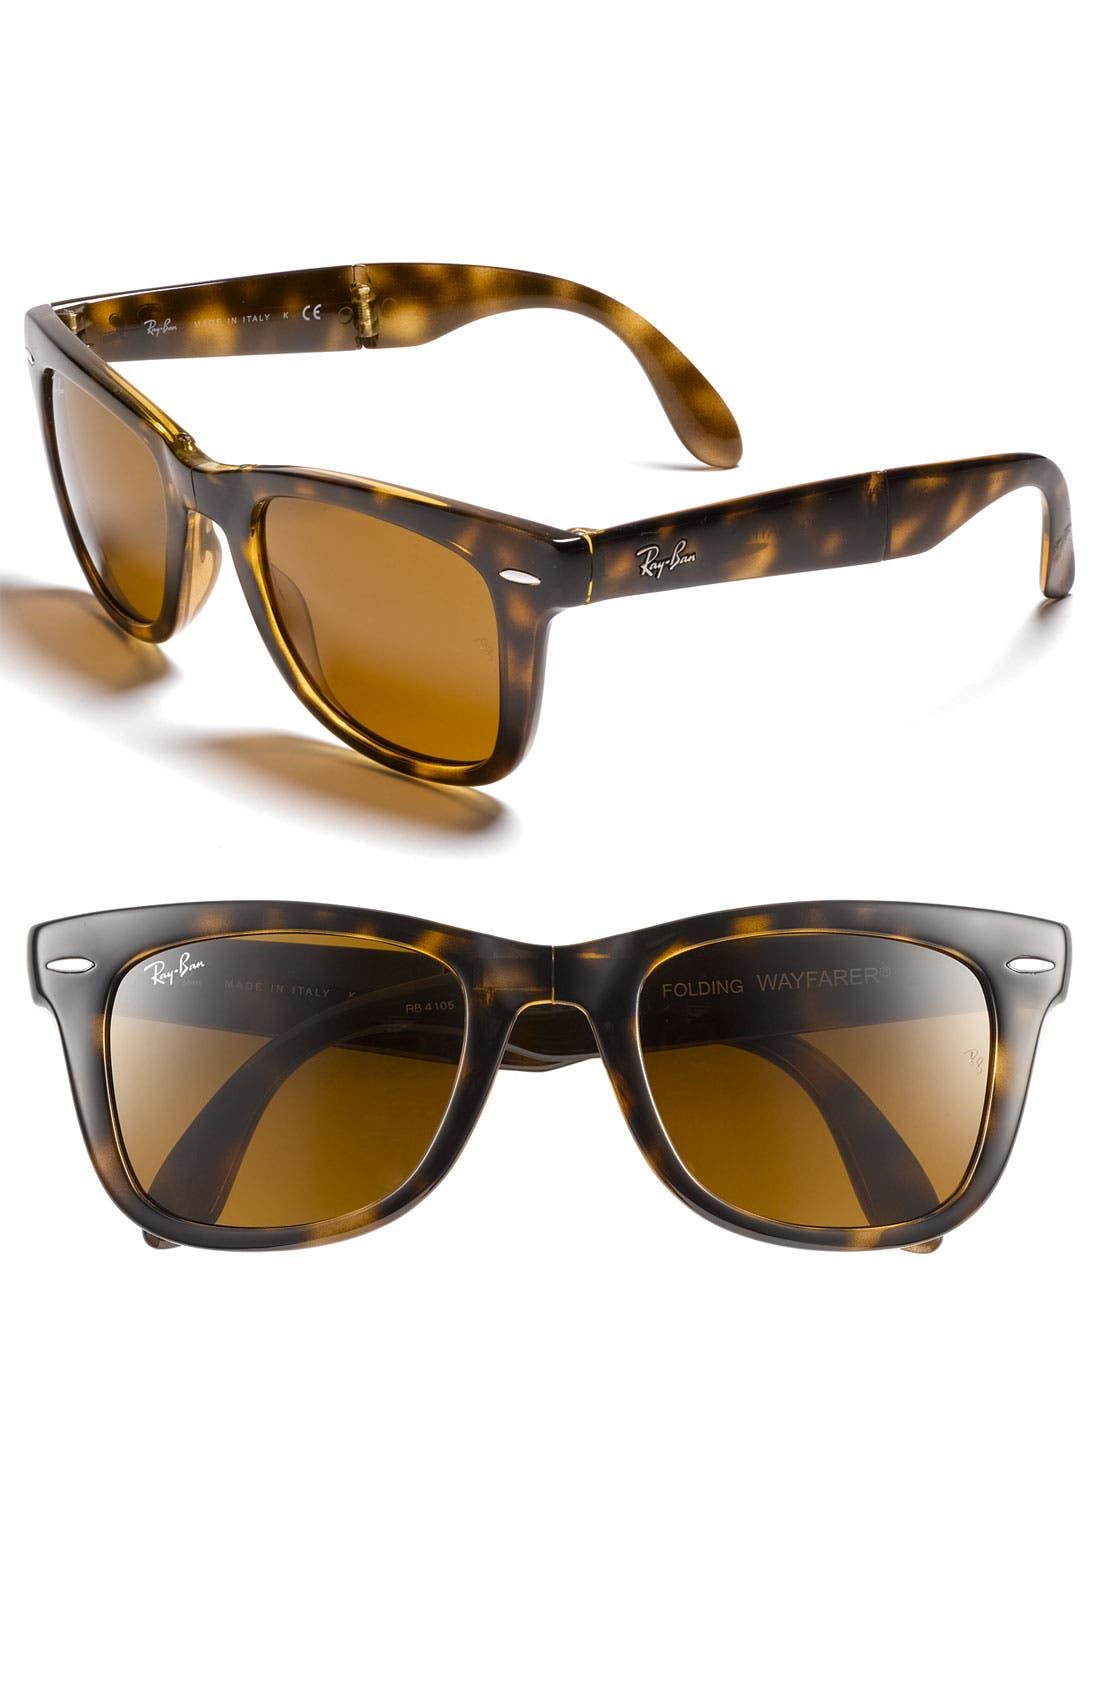 Standard 50mm Folding Wayfarer Sunglasses,                         Main,                         color, Brown Flash